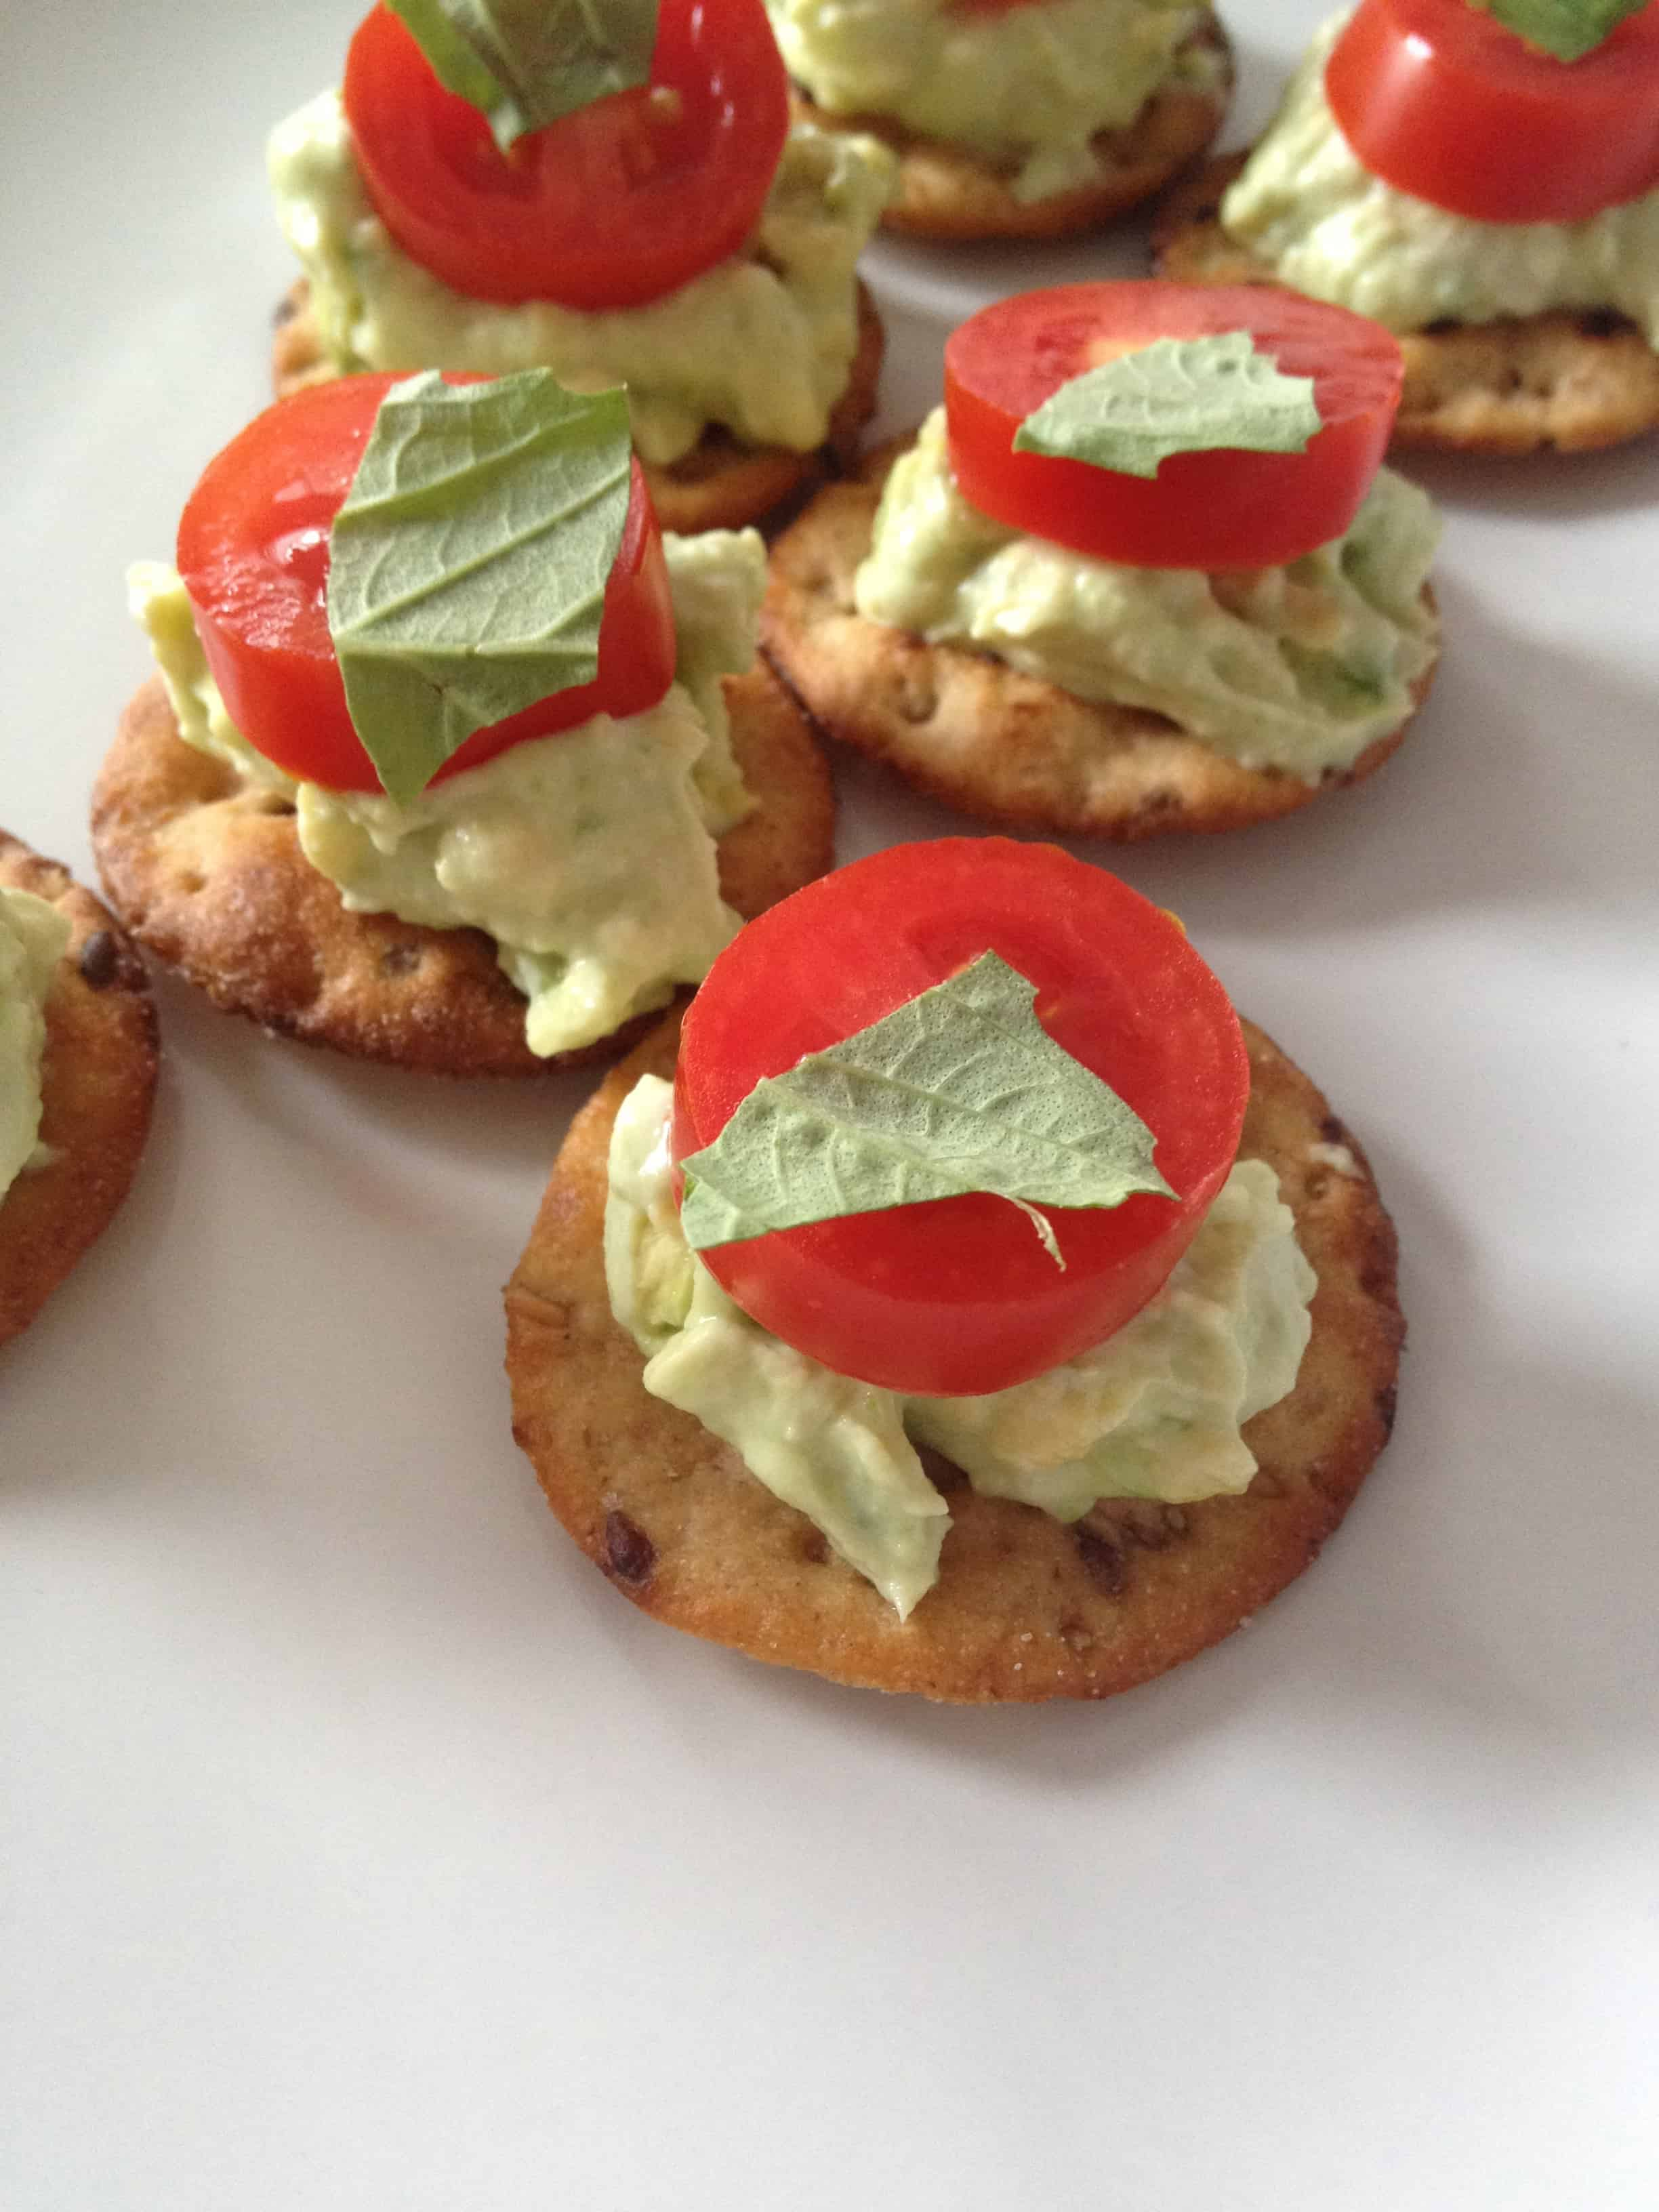 No-Cook Homemade Snacks : Fruit Sticks, Banana Butterflies, and Avocado Toasts